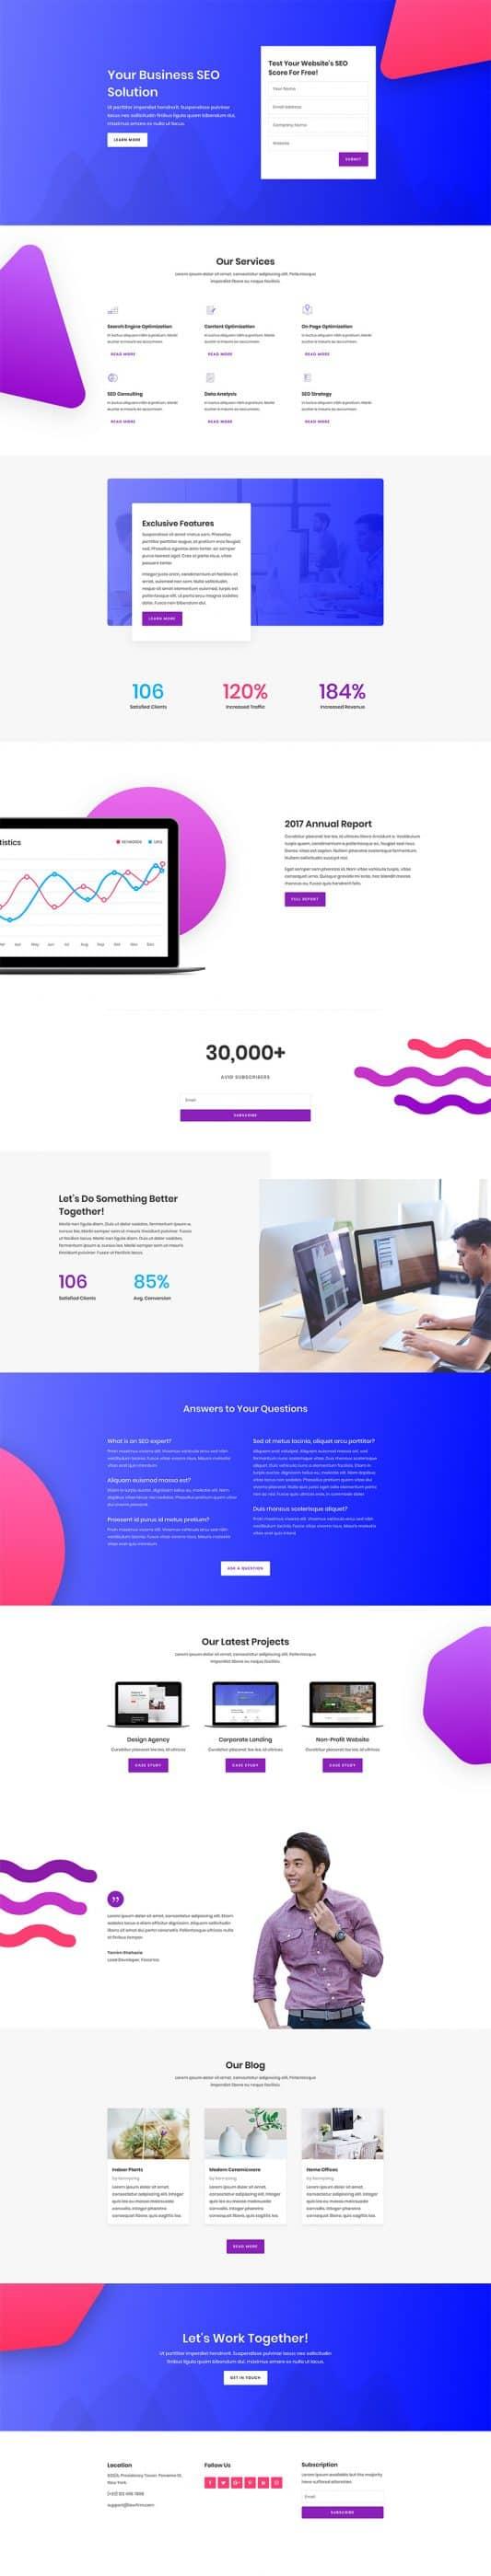 SEO Agency Web Design 6